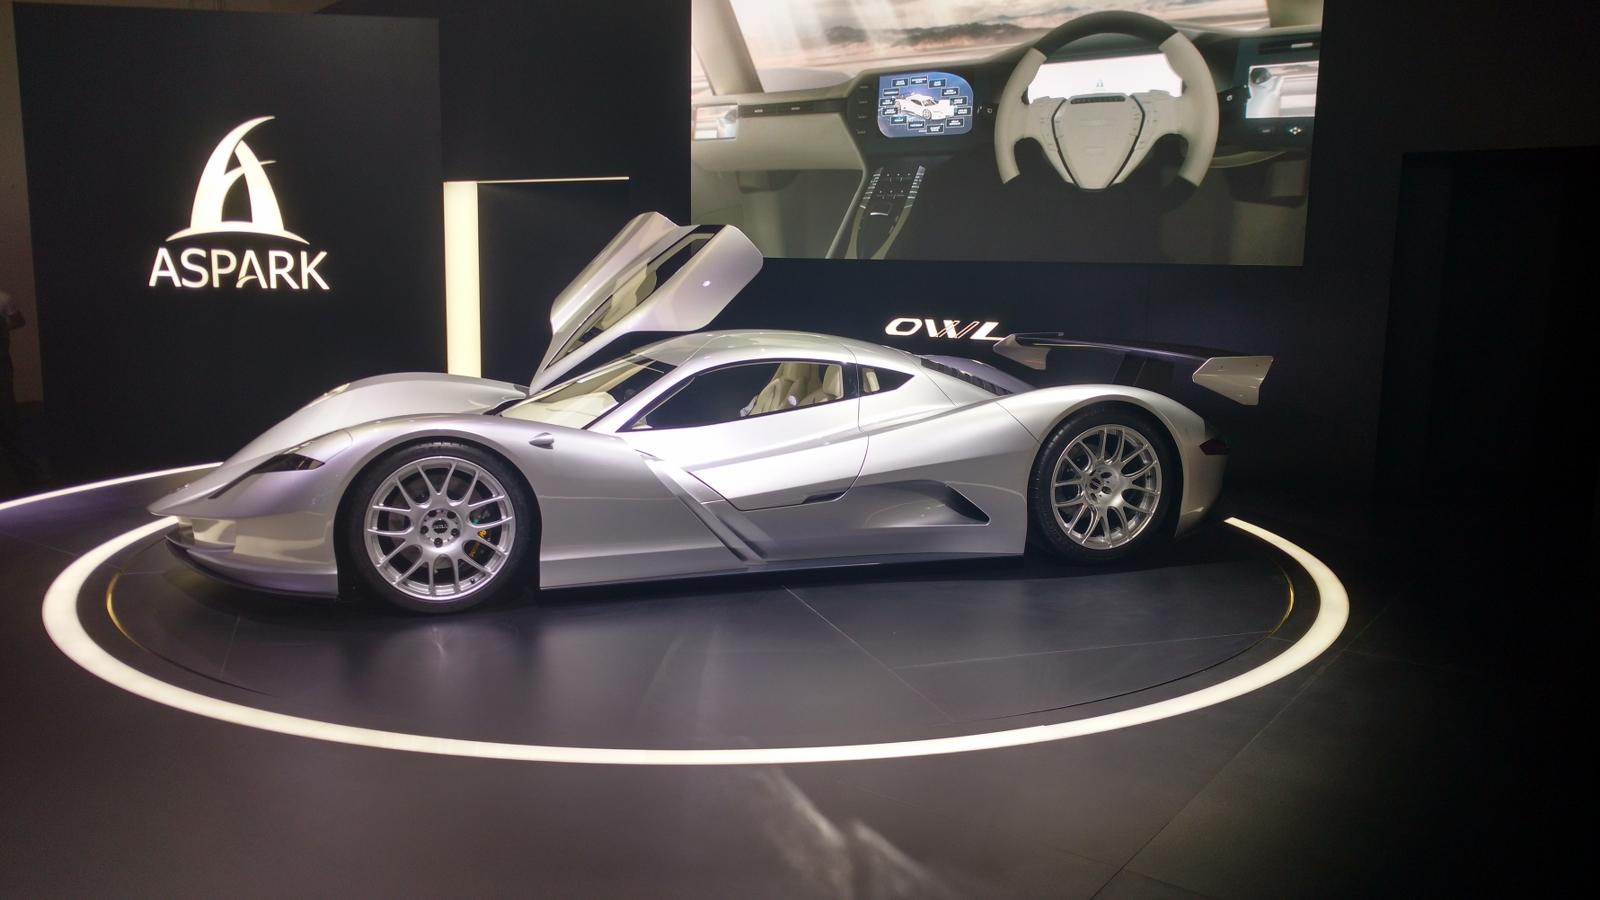 Marca japonesa diz ter carro mais rápido que o Bugatti Chiron